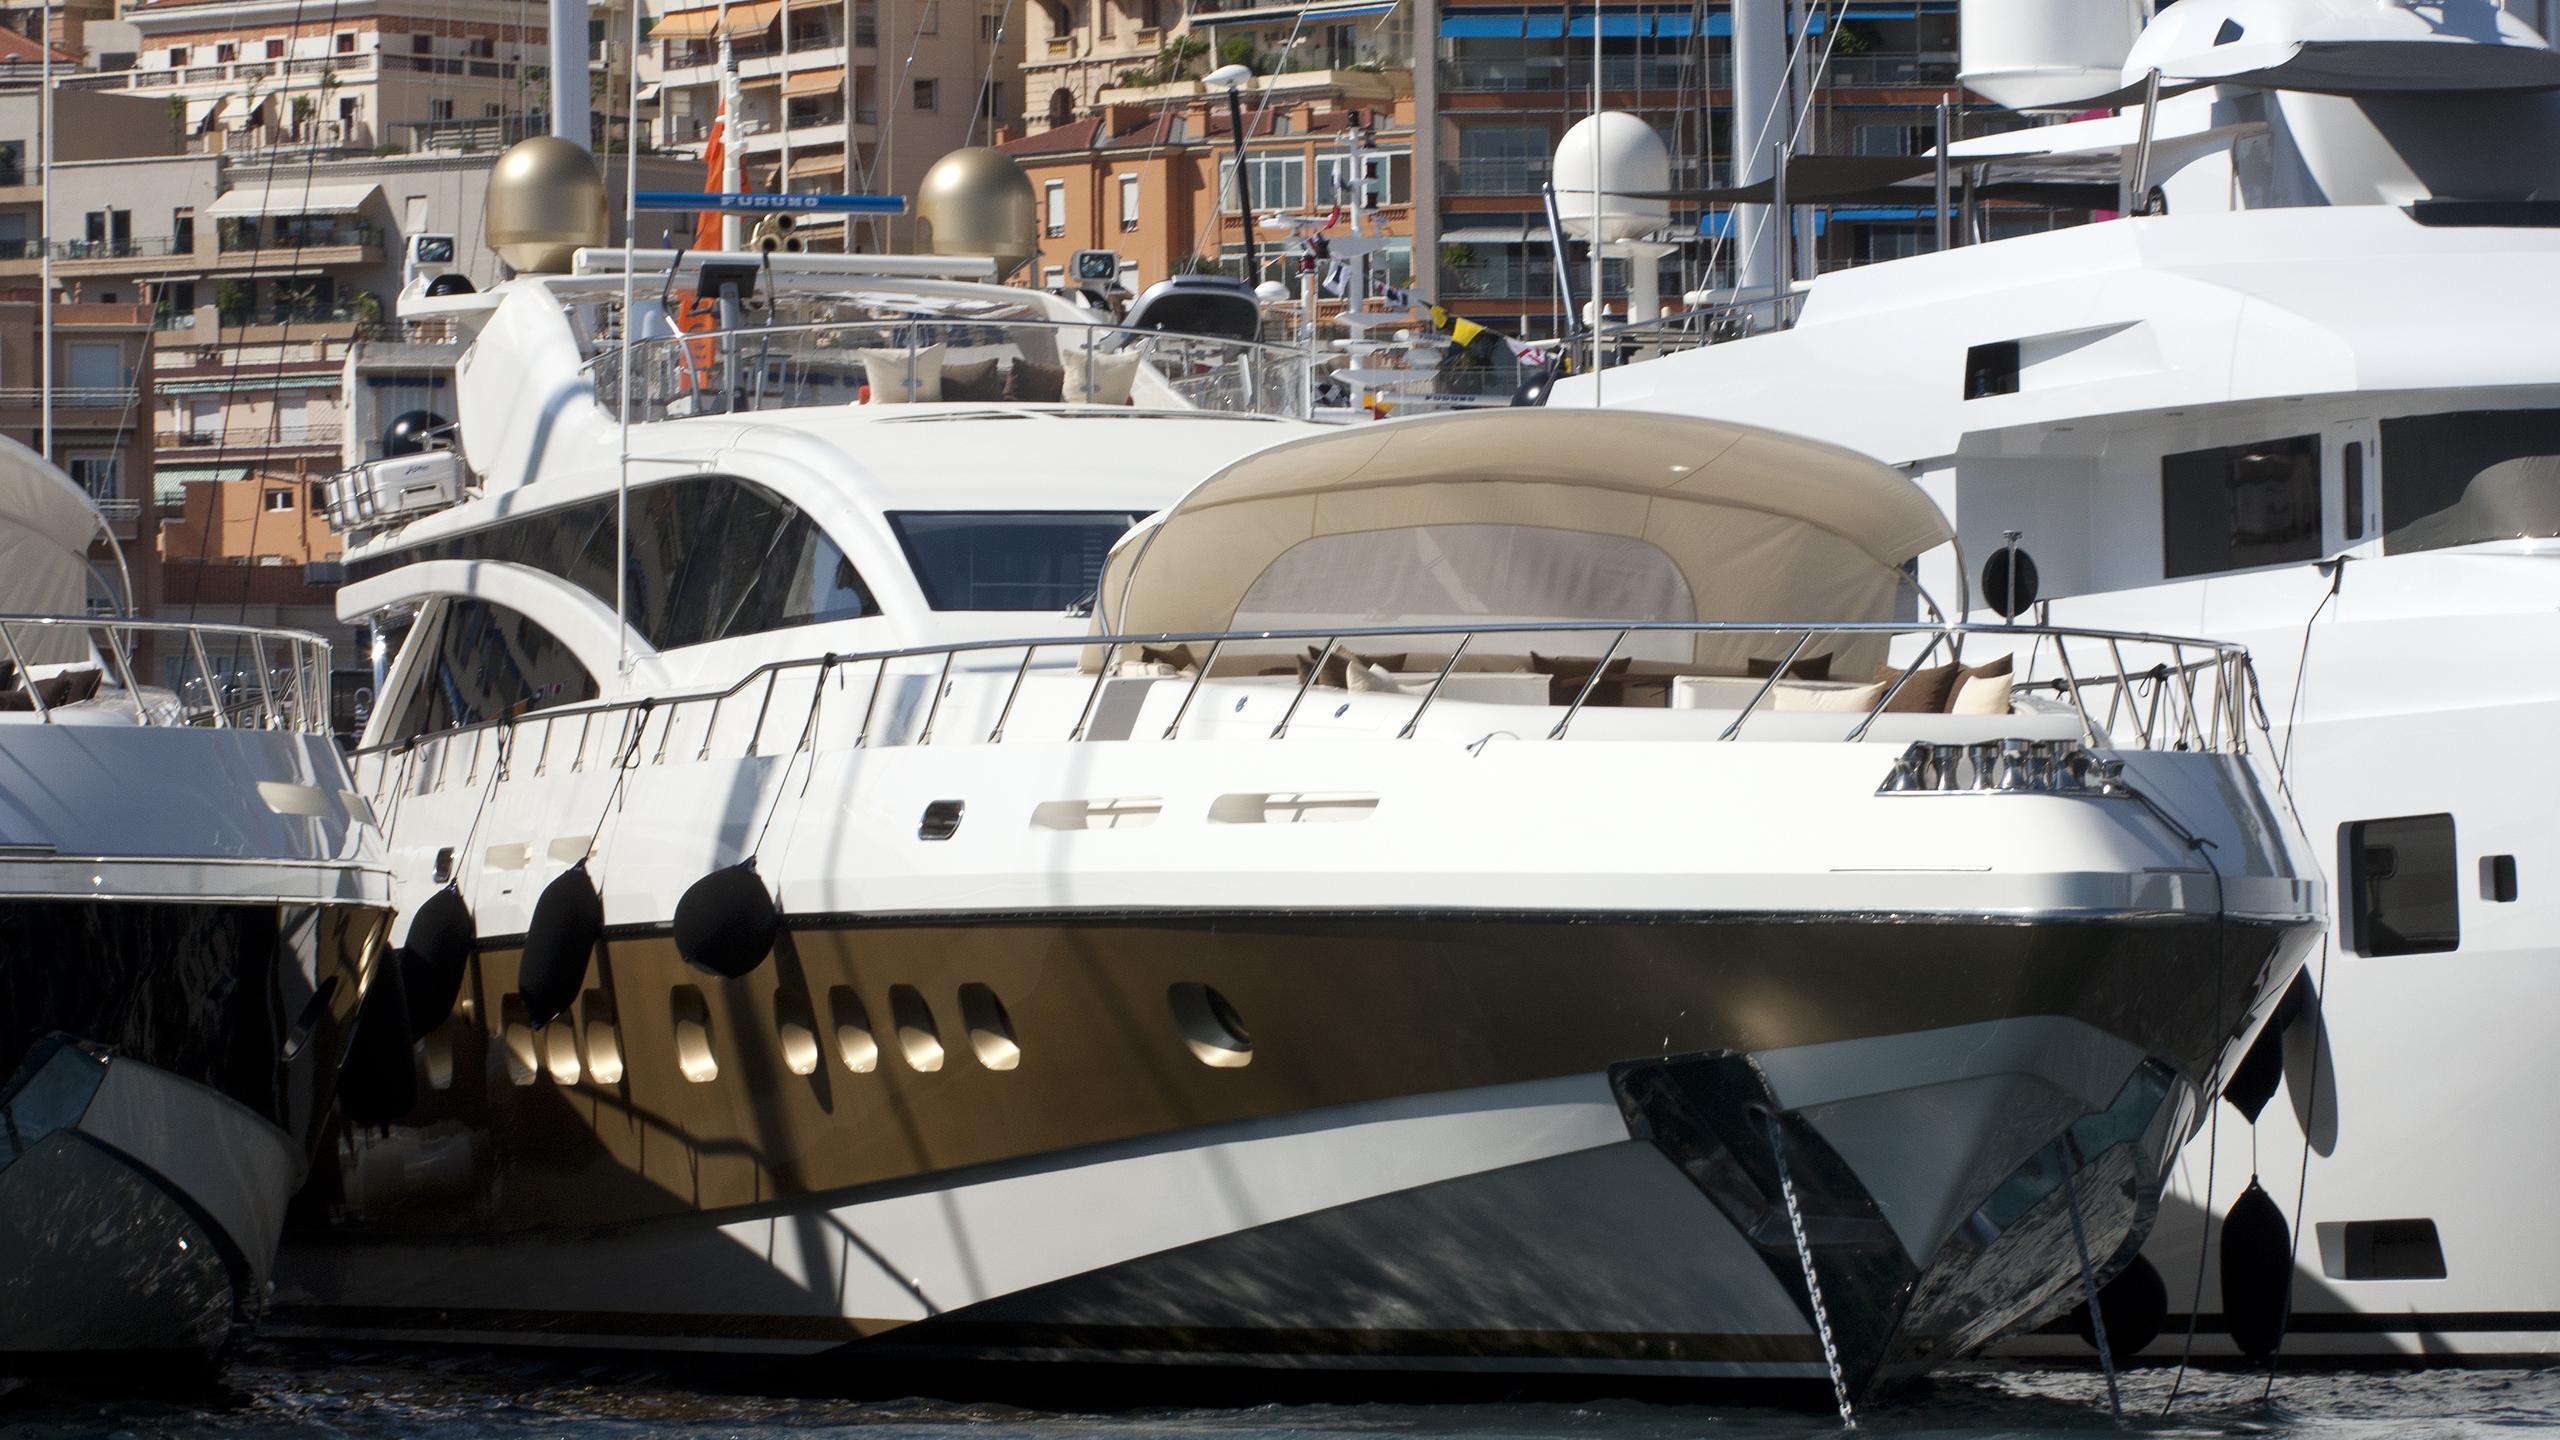 antelope iv motoryacht italyachts leopard 43m 2012 bow